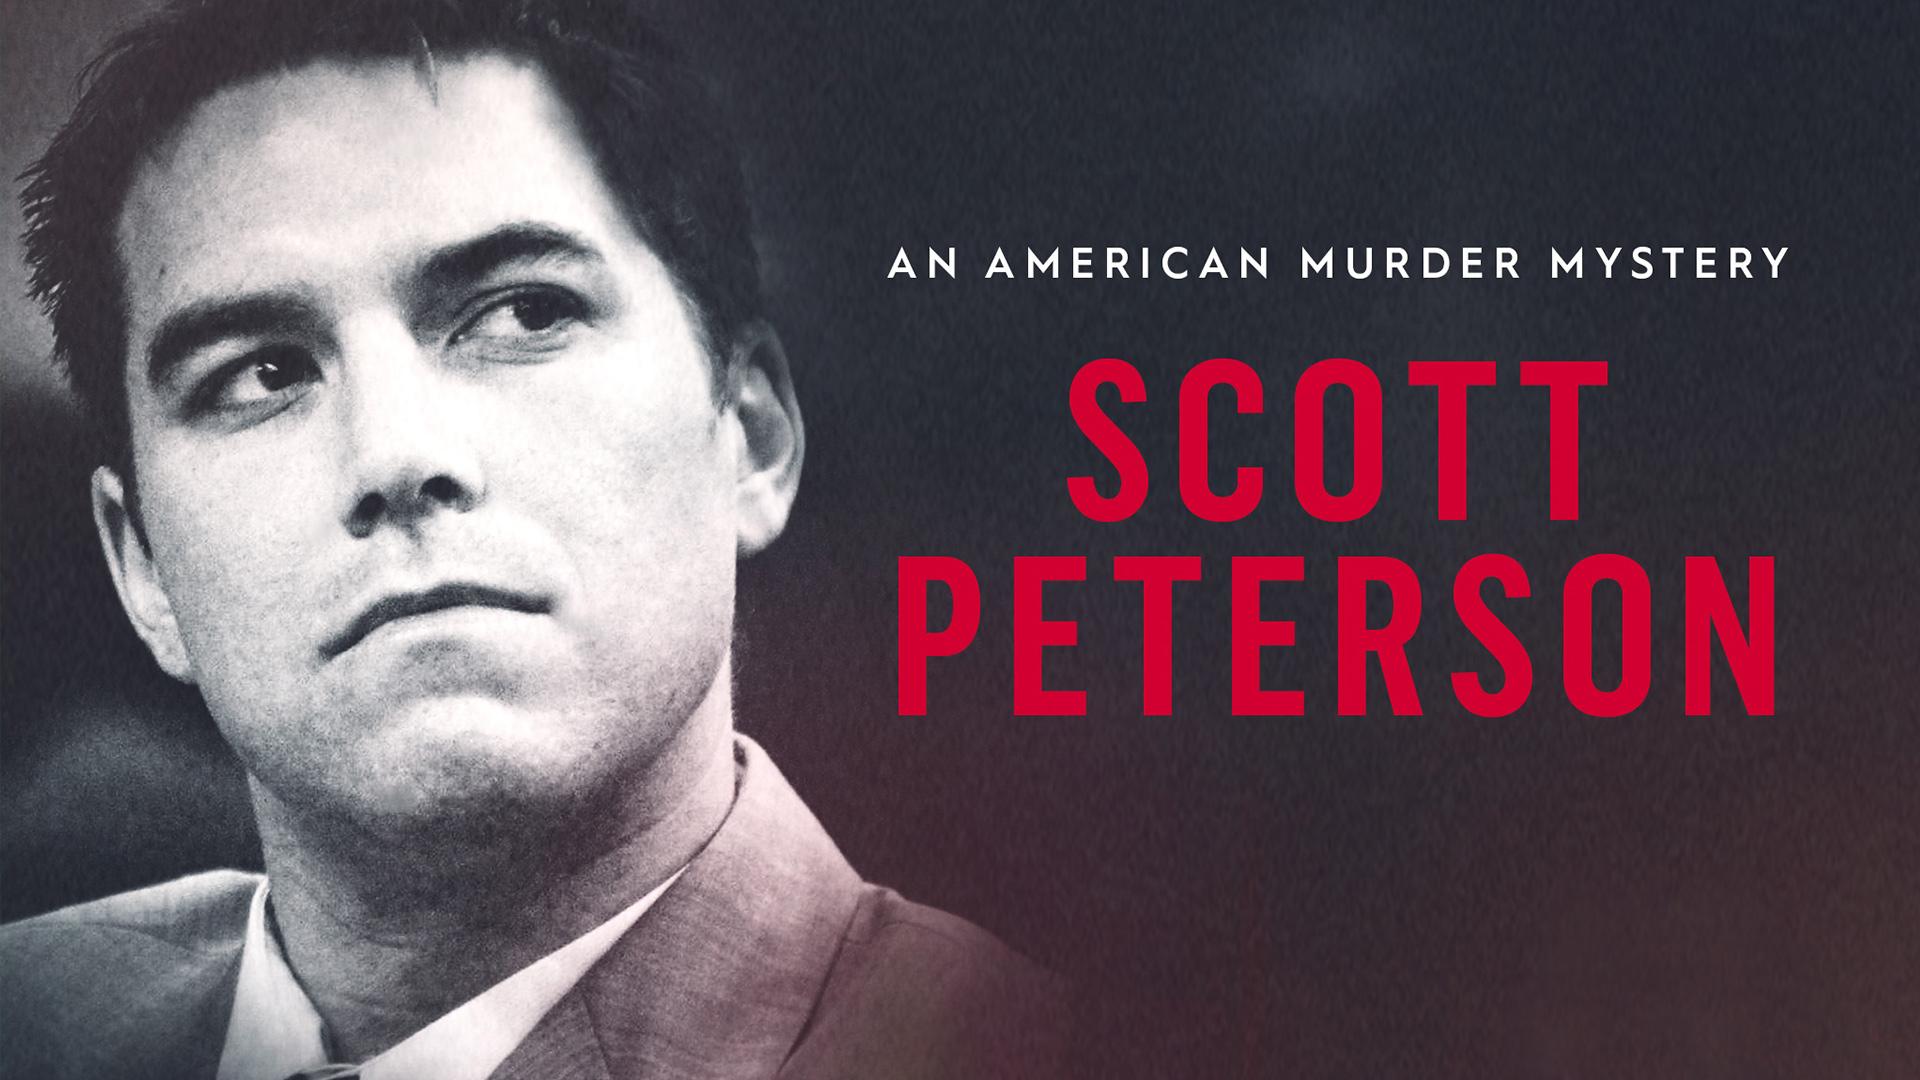 Scott Peterson An American Murder Mystery Season 1